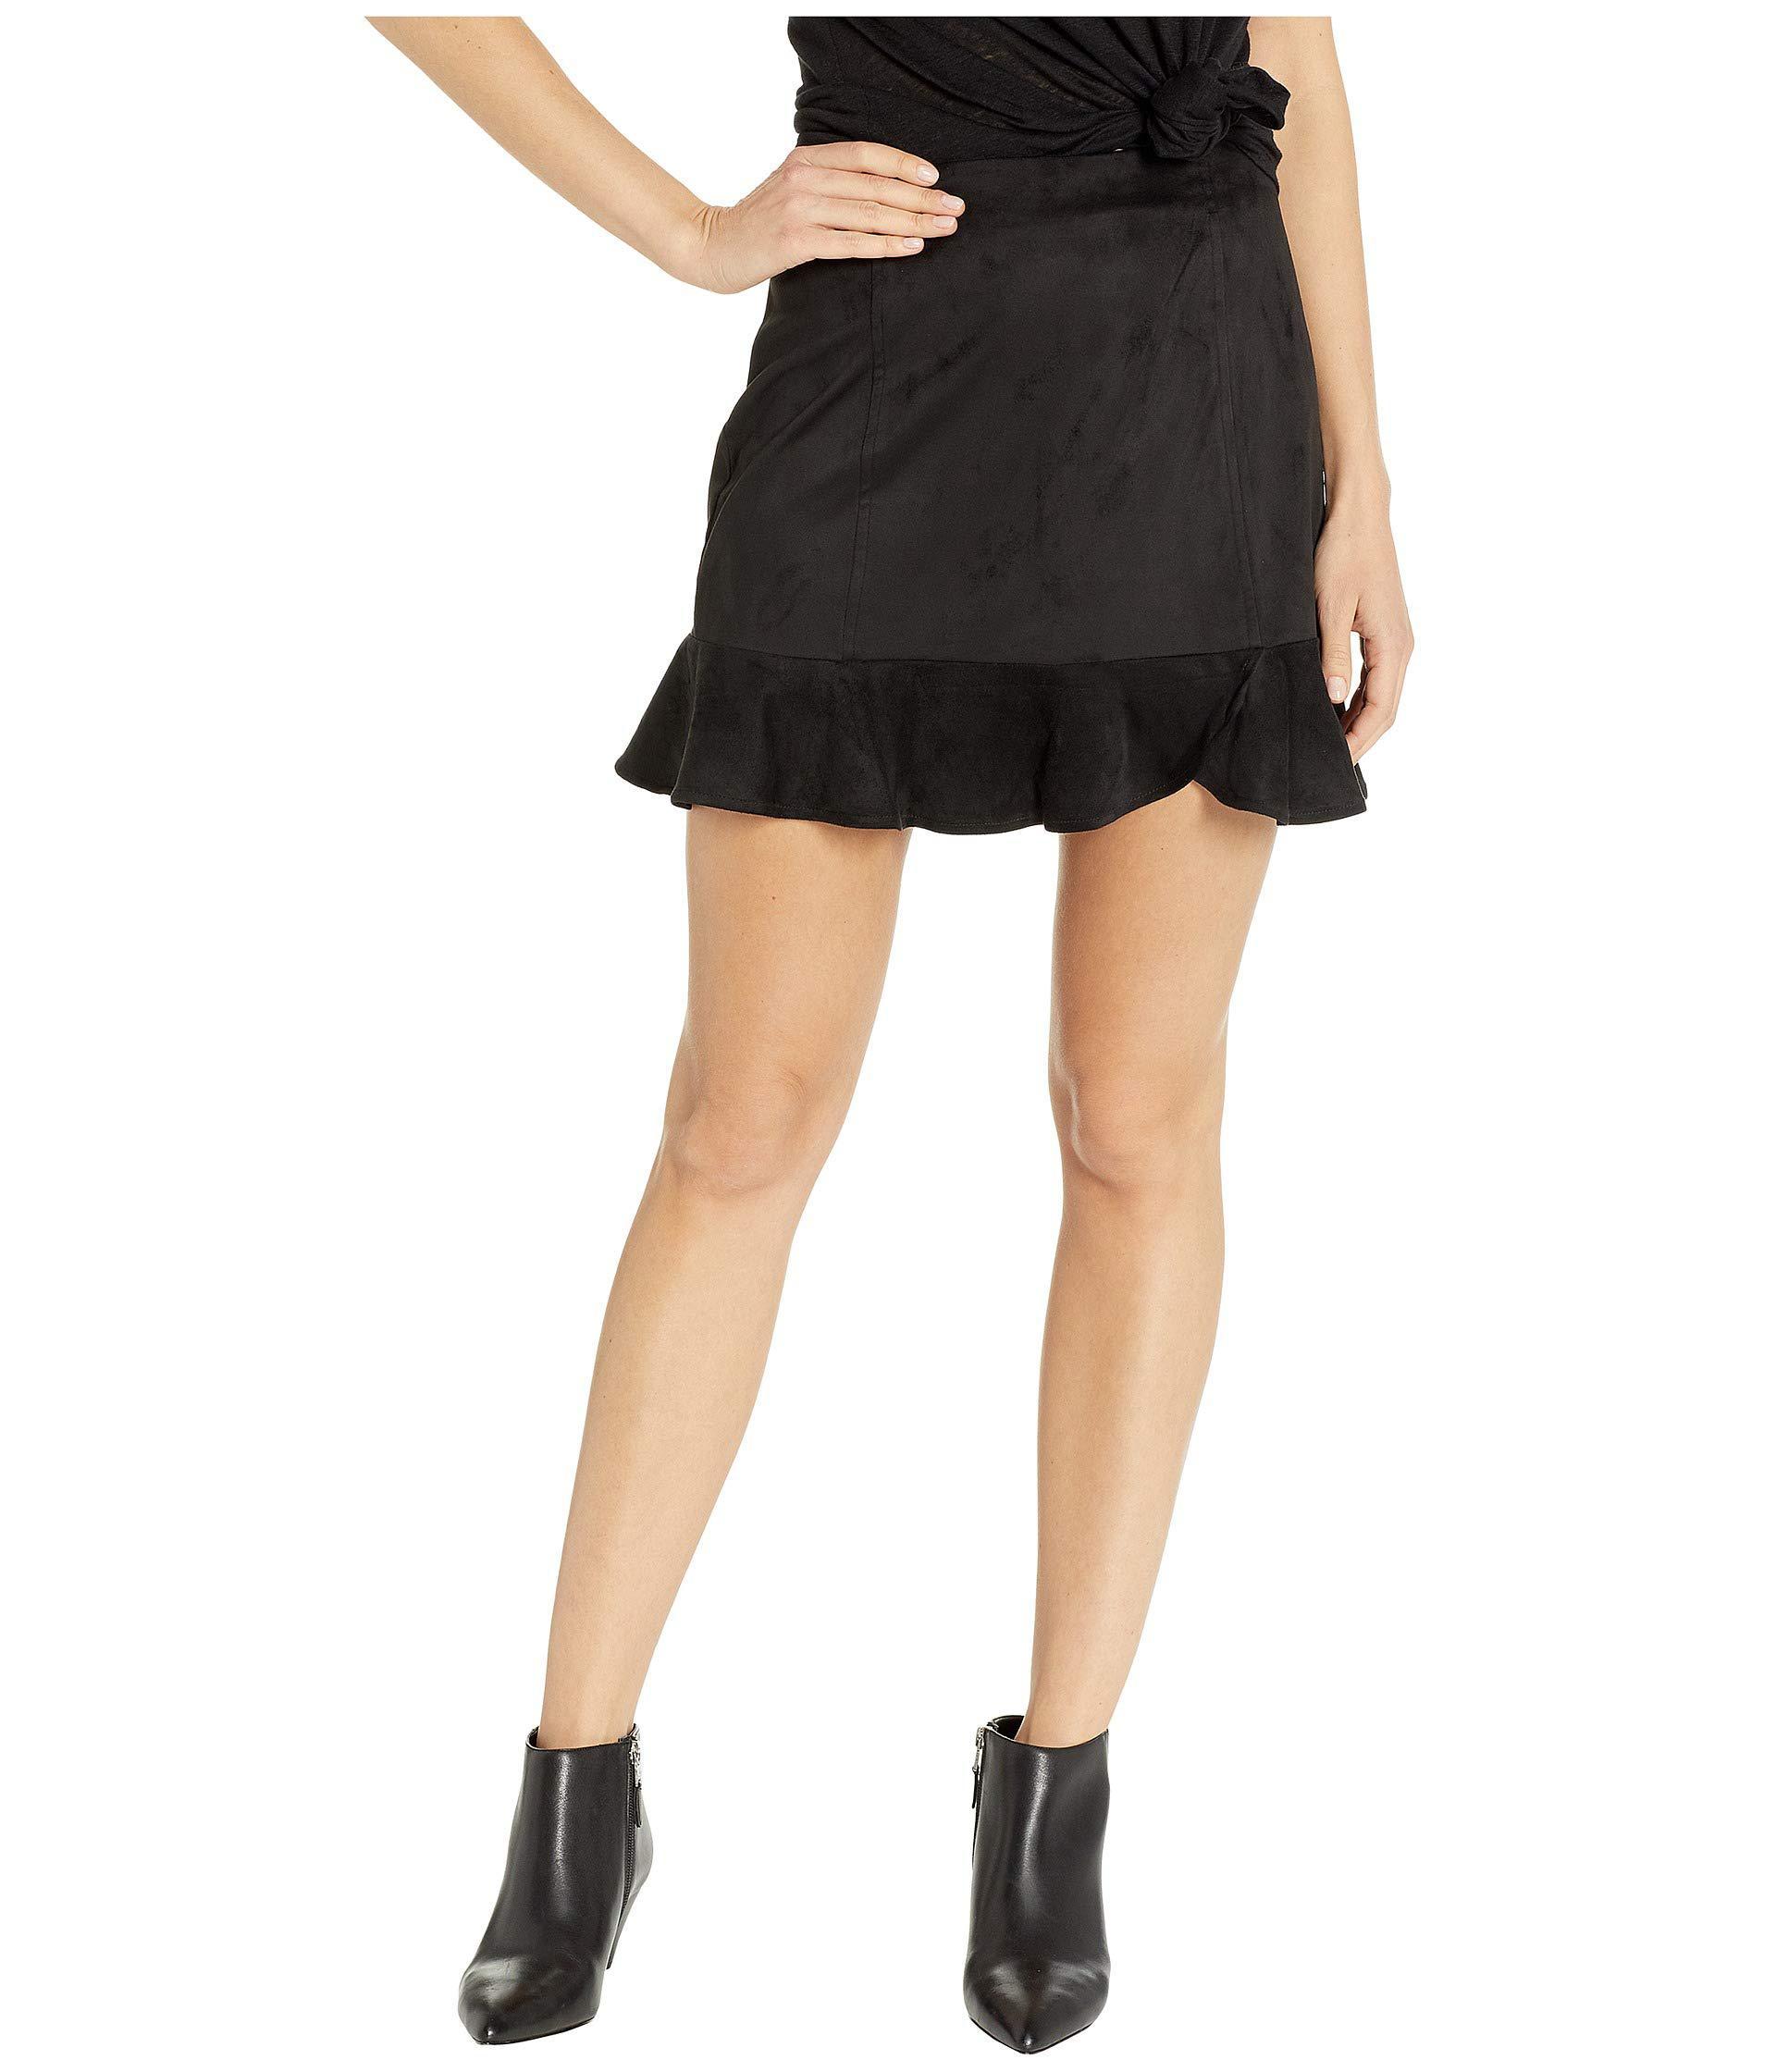 ff0ff71bf Lyst - Jack BB Dakota Sagittarius Faux Suede Ruffle Skirt (black ...